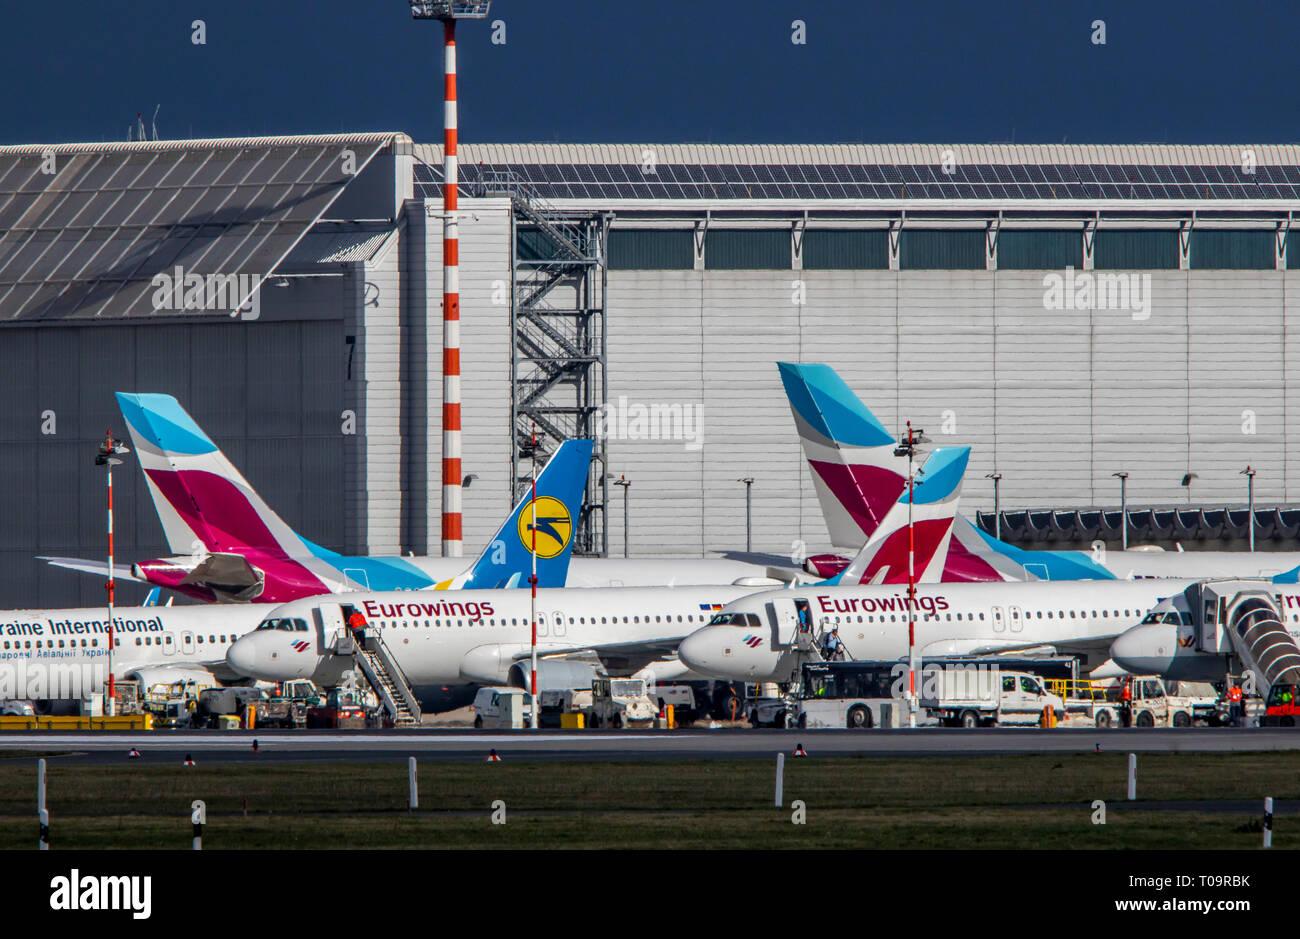 Dusseldorf International Airport, DUS, Eurowings Aircraft, - Stock Image